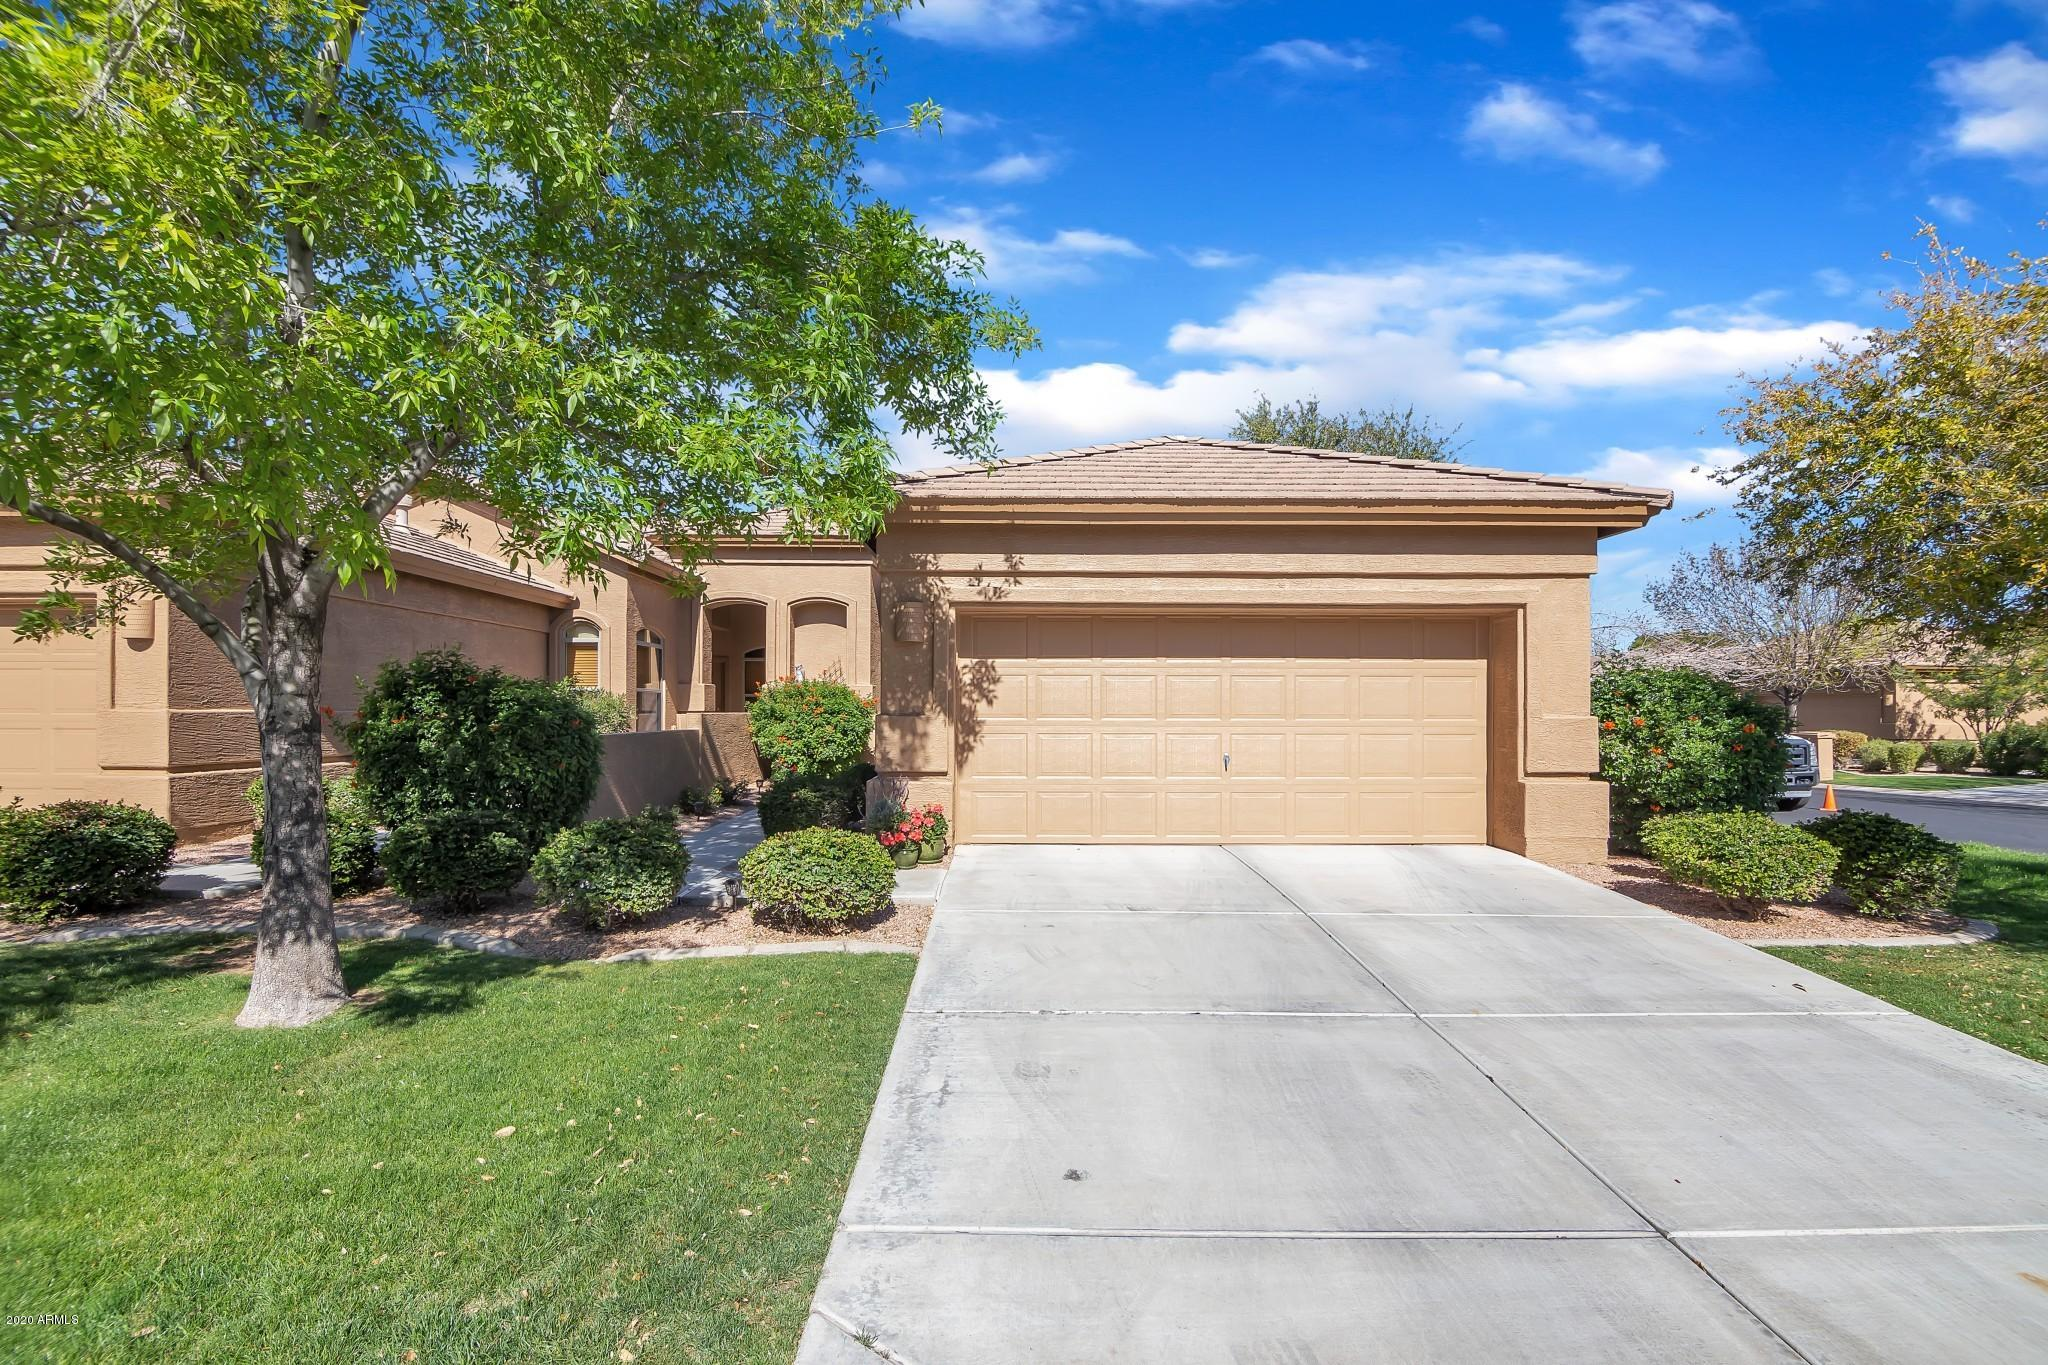 9644 E NACOMA Drive, Sun Lakes, AZ 85248, 2 Bedrooms Bedrooms, ,Residential Lease,For Rent,9644 E NACOMA Drive,6043088